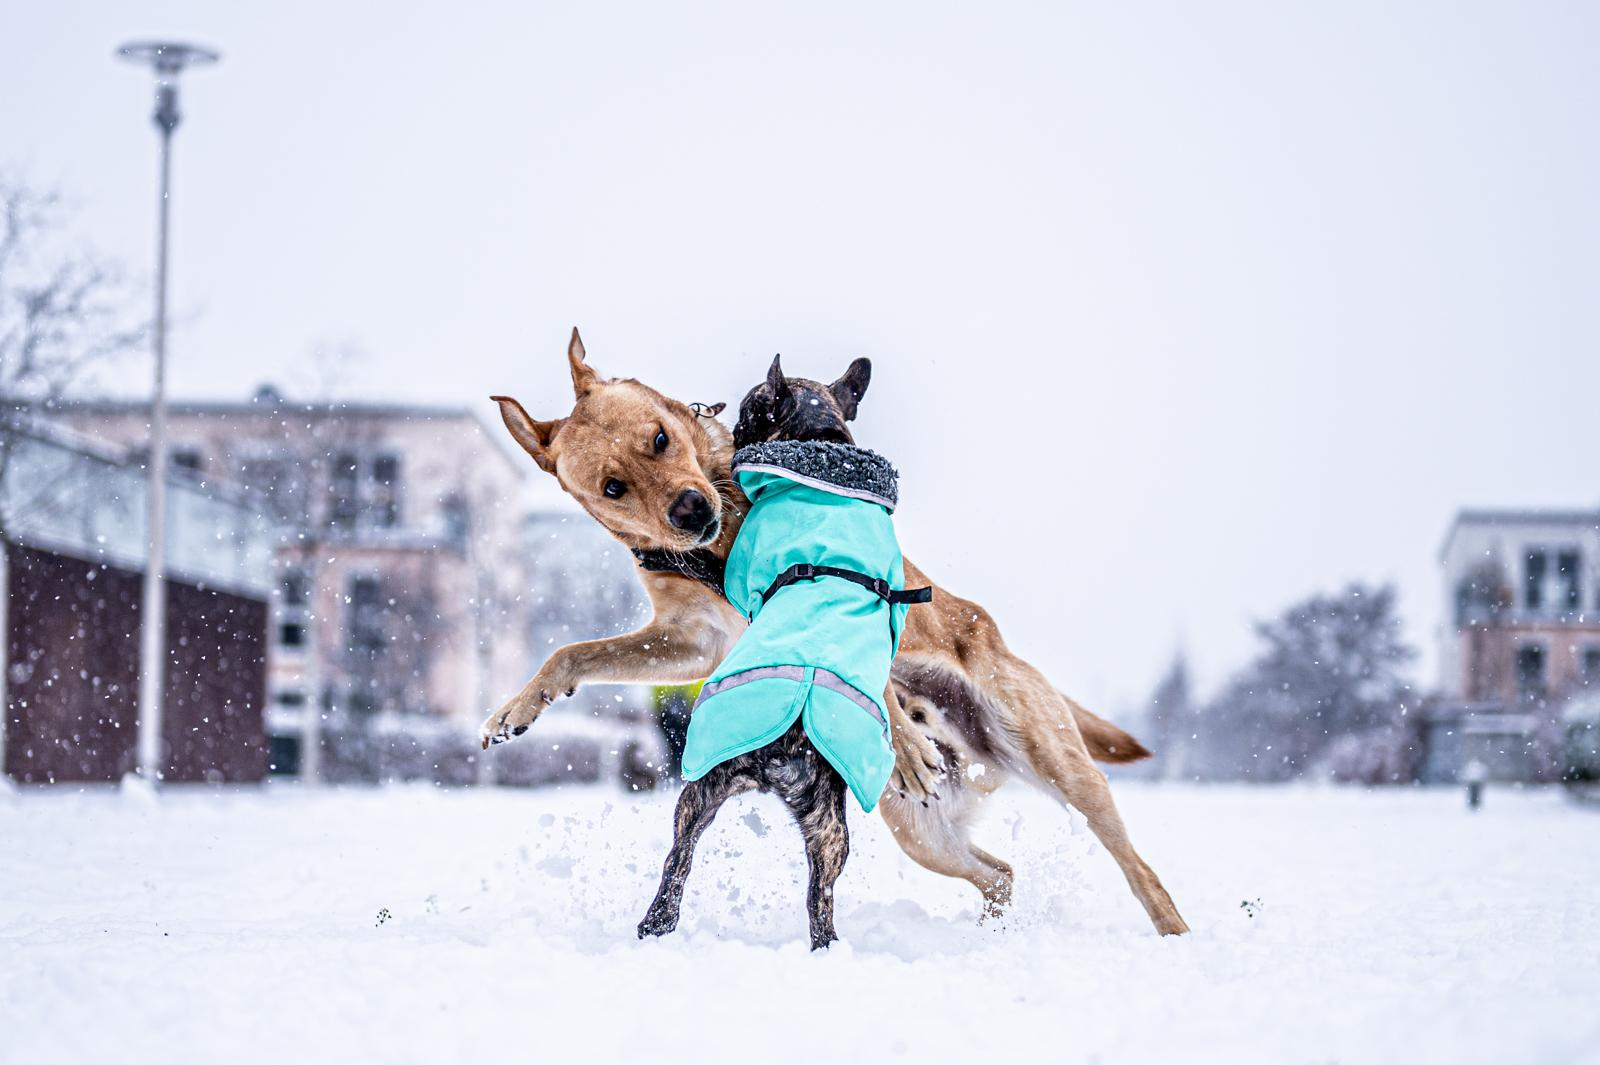 Tierfotograf-Labrador-Sven's Bildwerke-Hund-Hundefotografie23